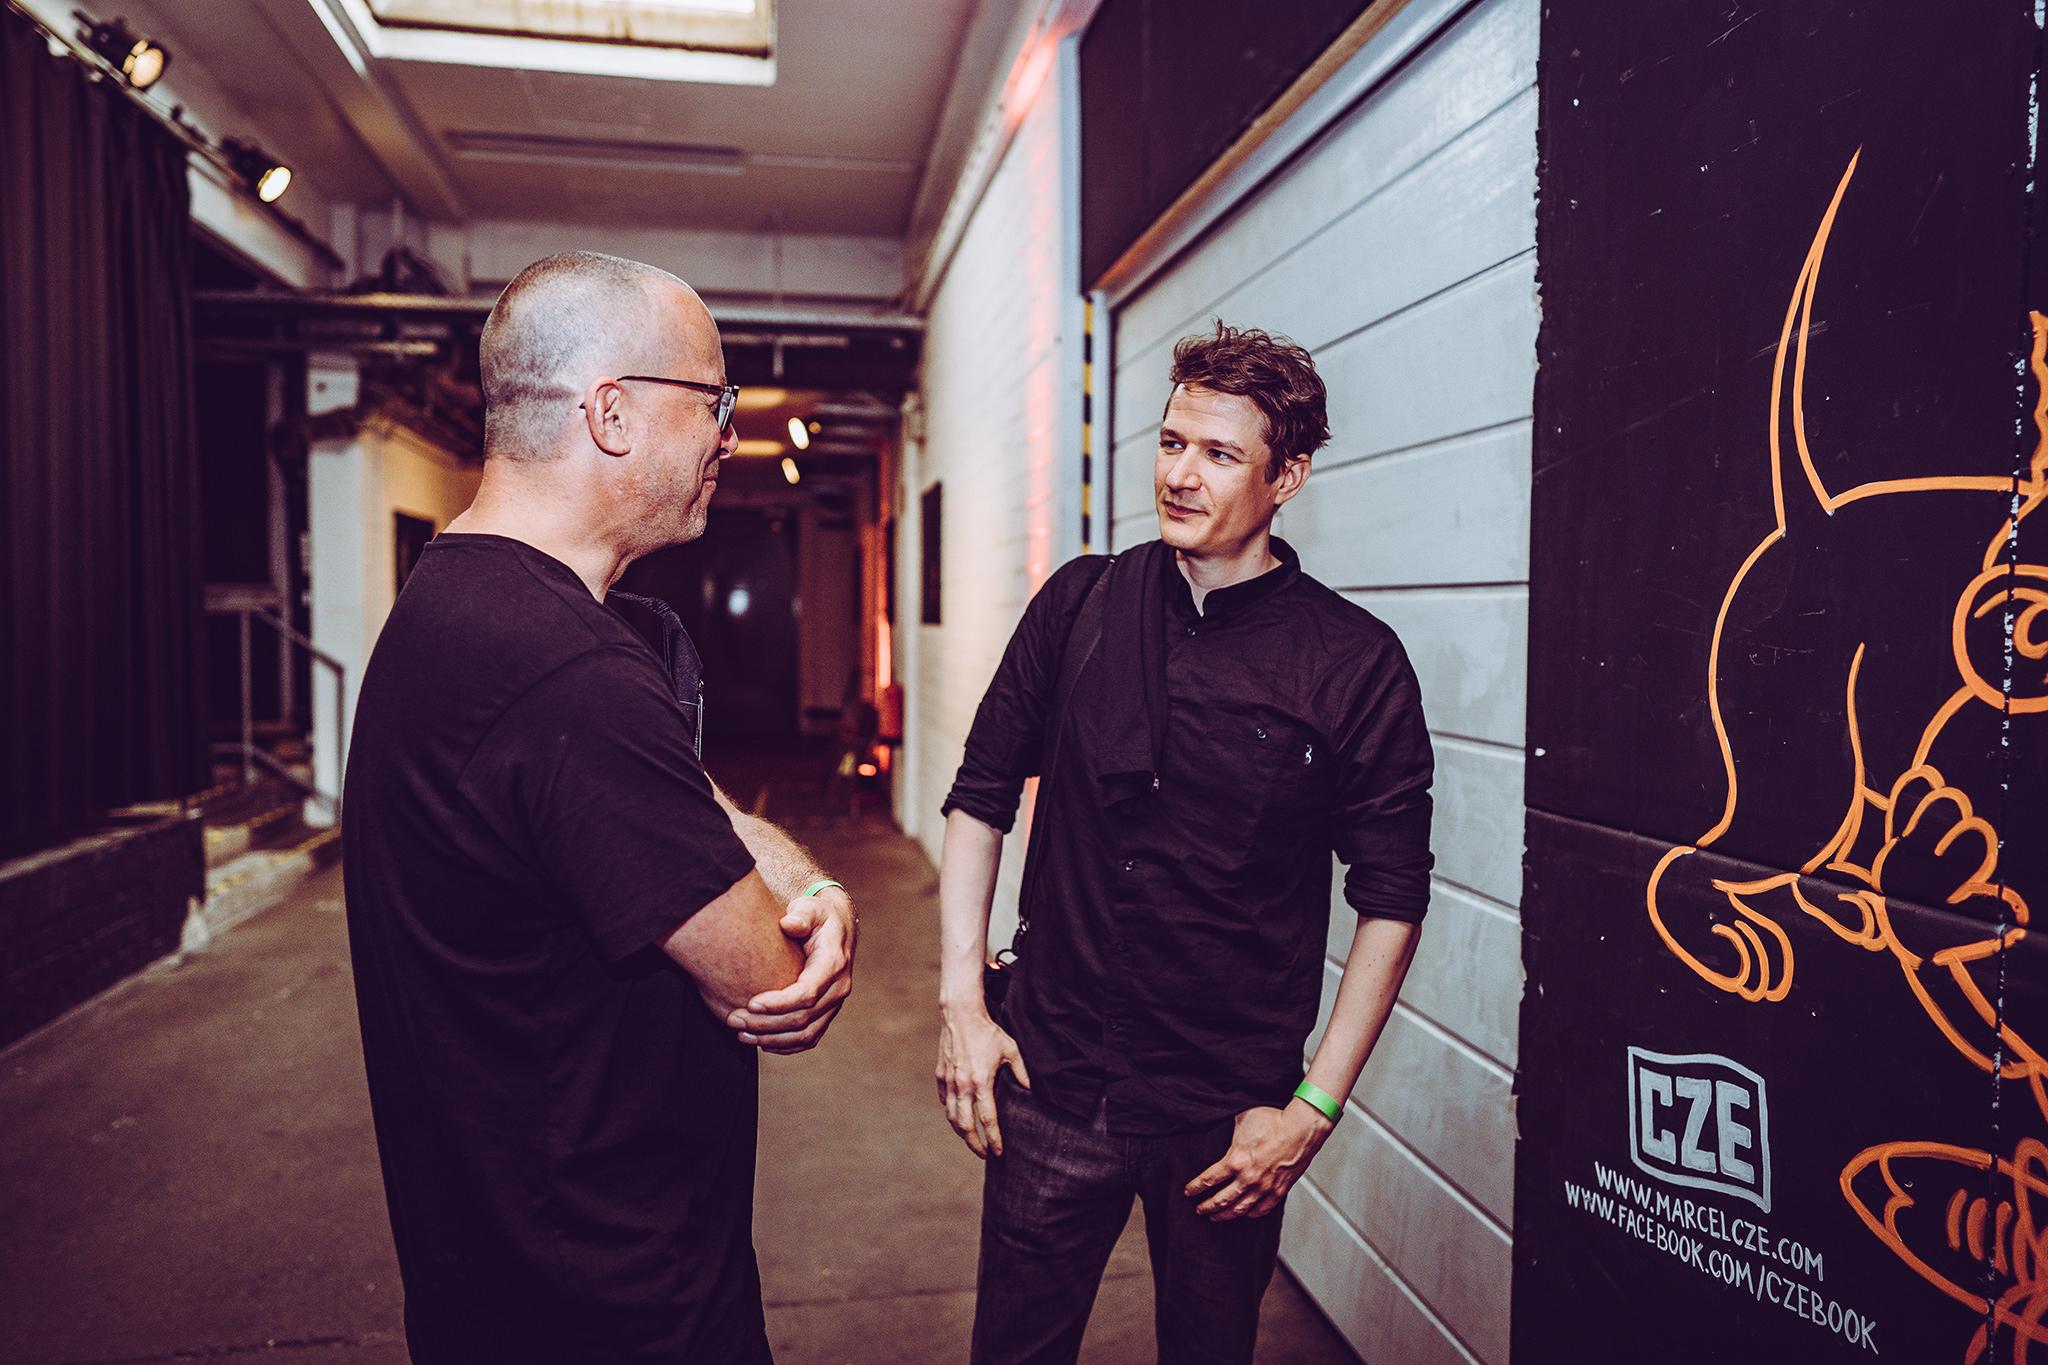 Christian Fu Müller (Hiphop.de/ManeraMedia/beatcon) im Gespräch mit Journalist Falk Schacht